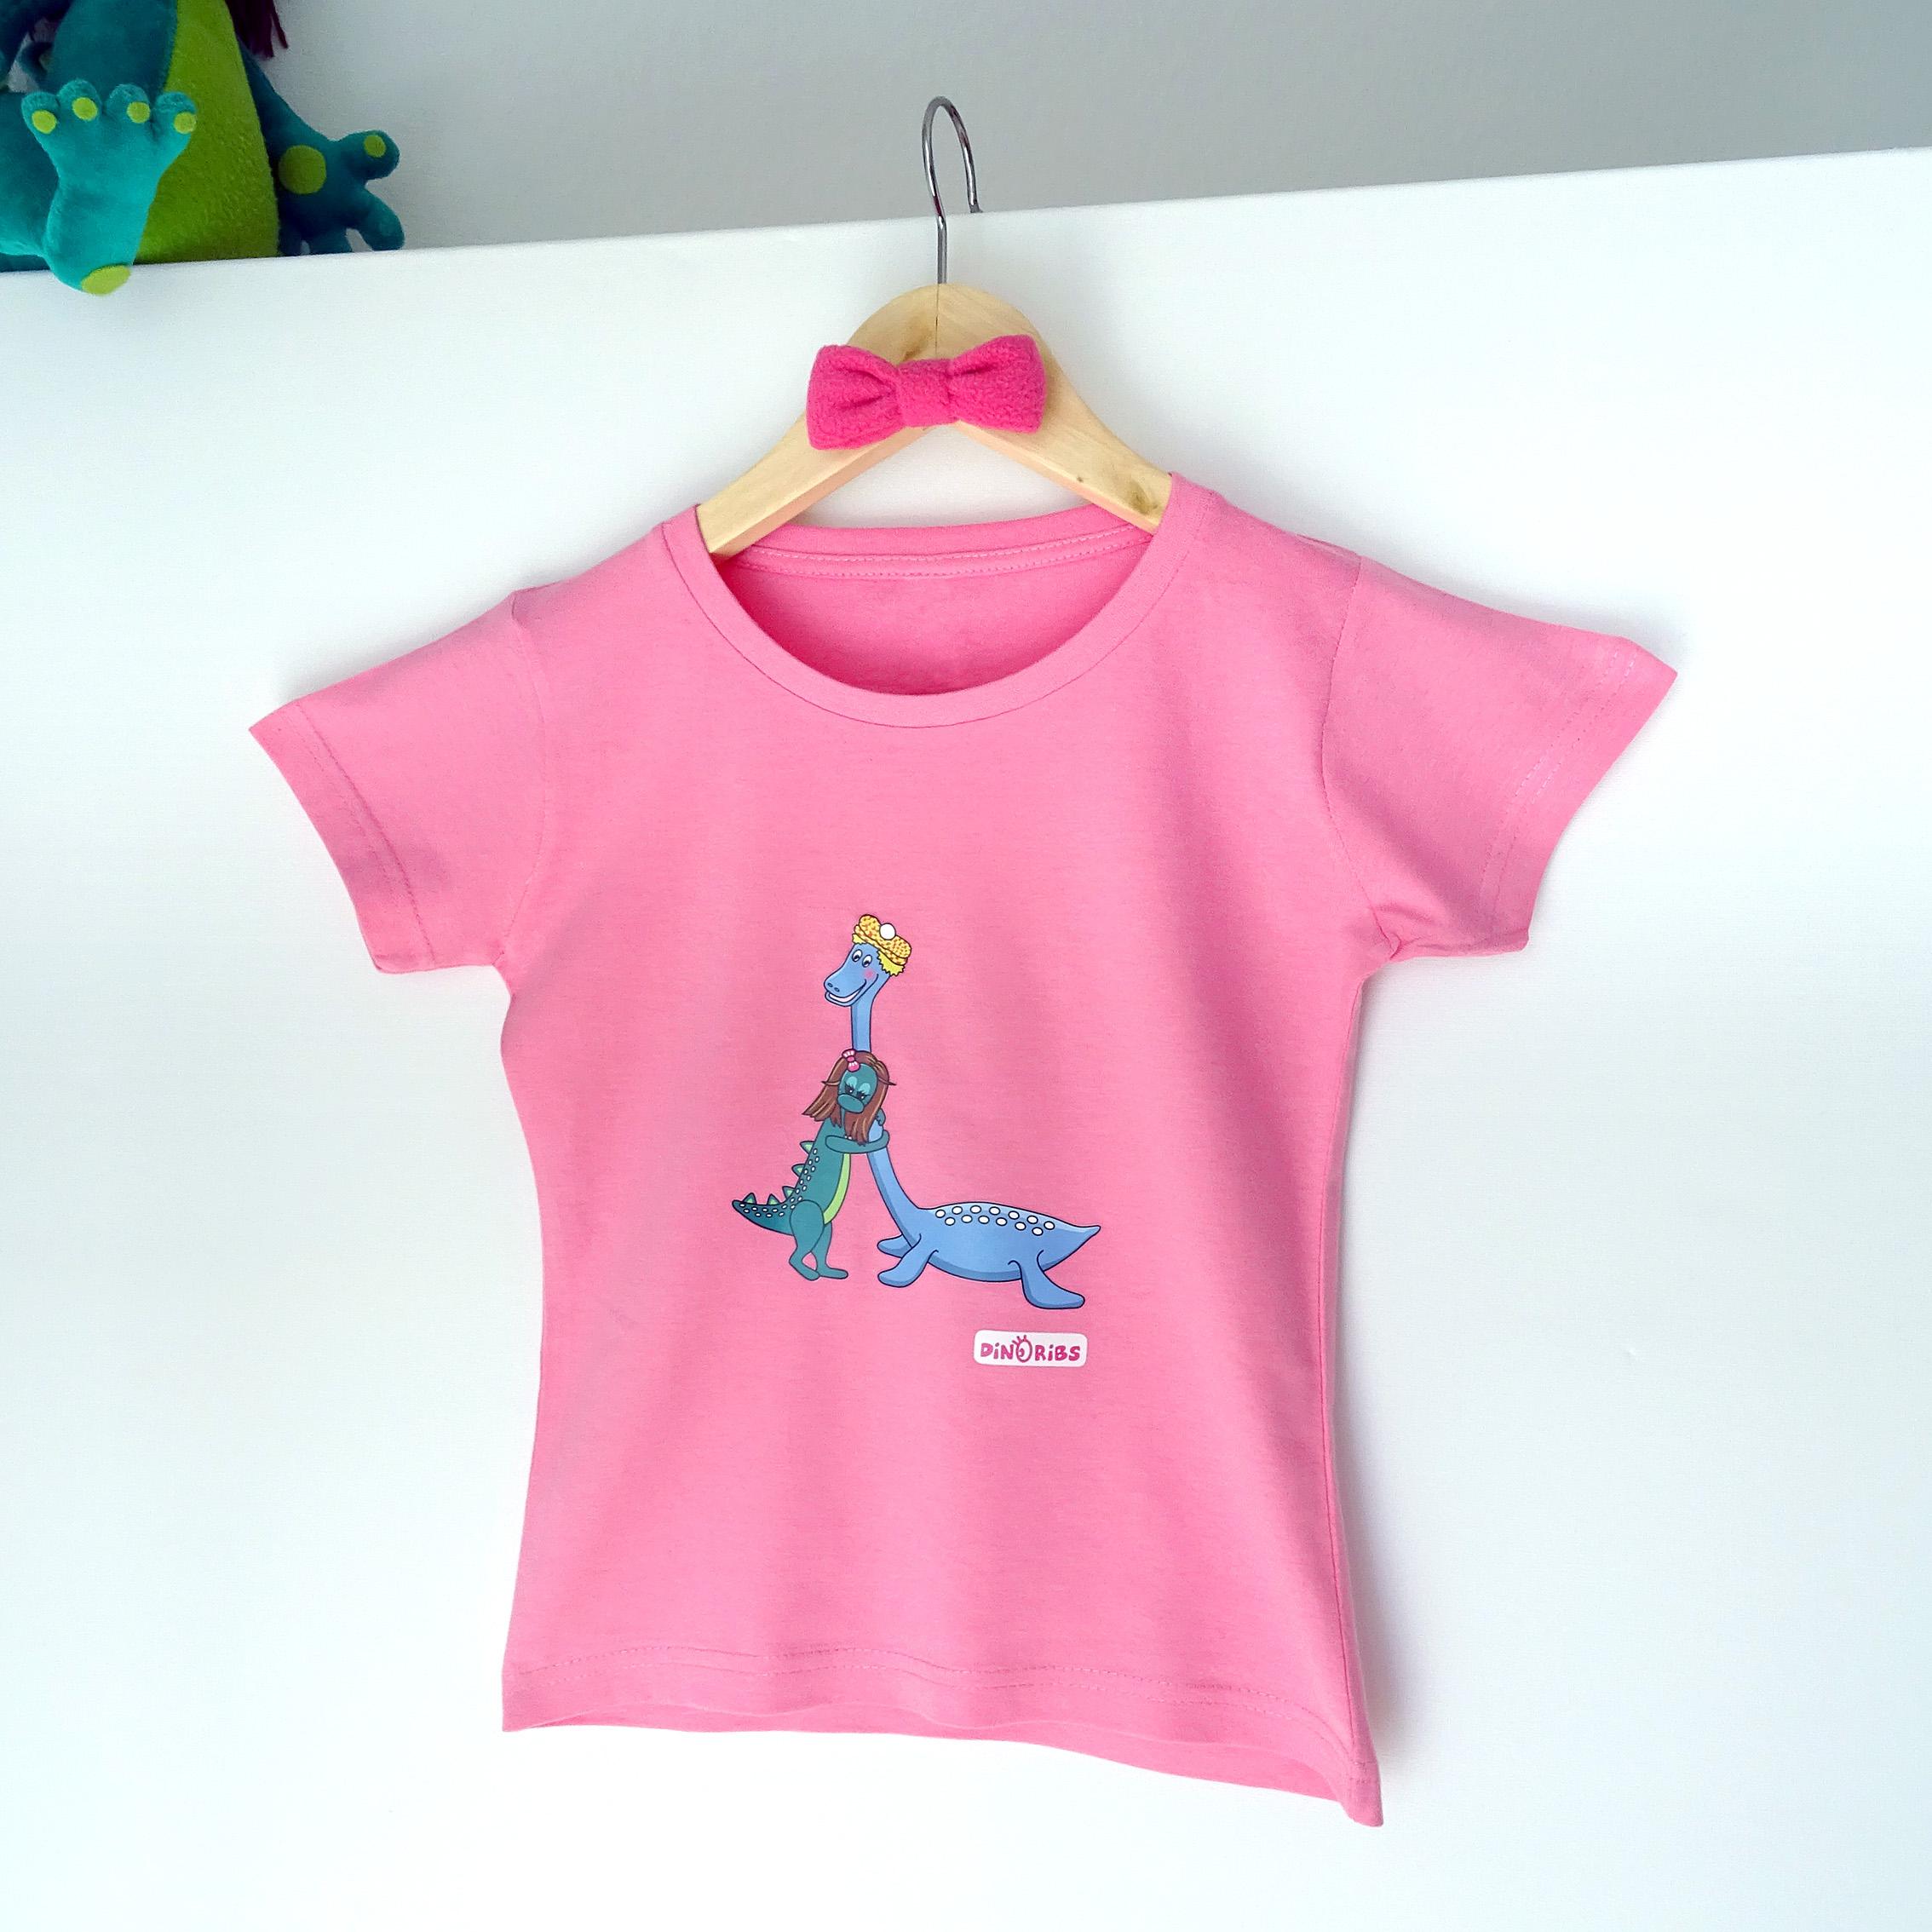 Tee-shirt Meilleurs Amis made by Dinoribs